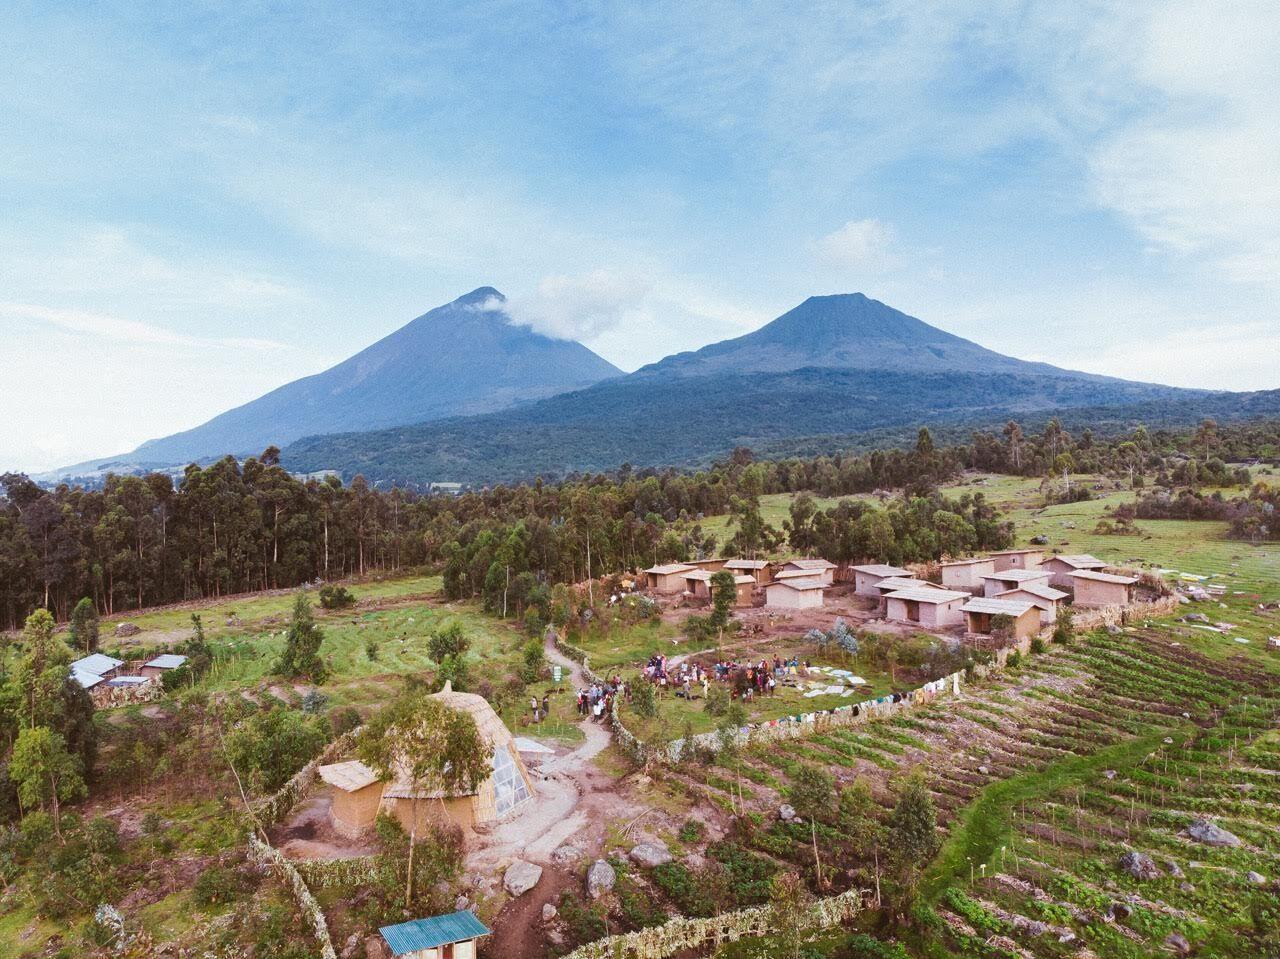 Volcanoes Safaris Partnership Trust - Grant Amount: $16,500Grant Year: 2017Project: Restoring hope to the Gahinga community in Uganda.